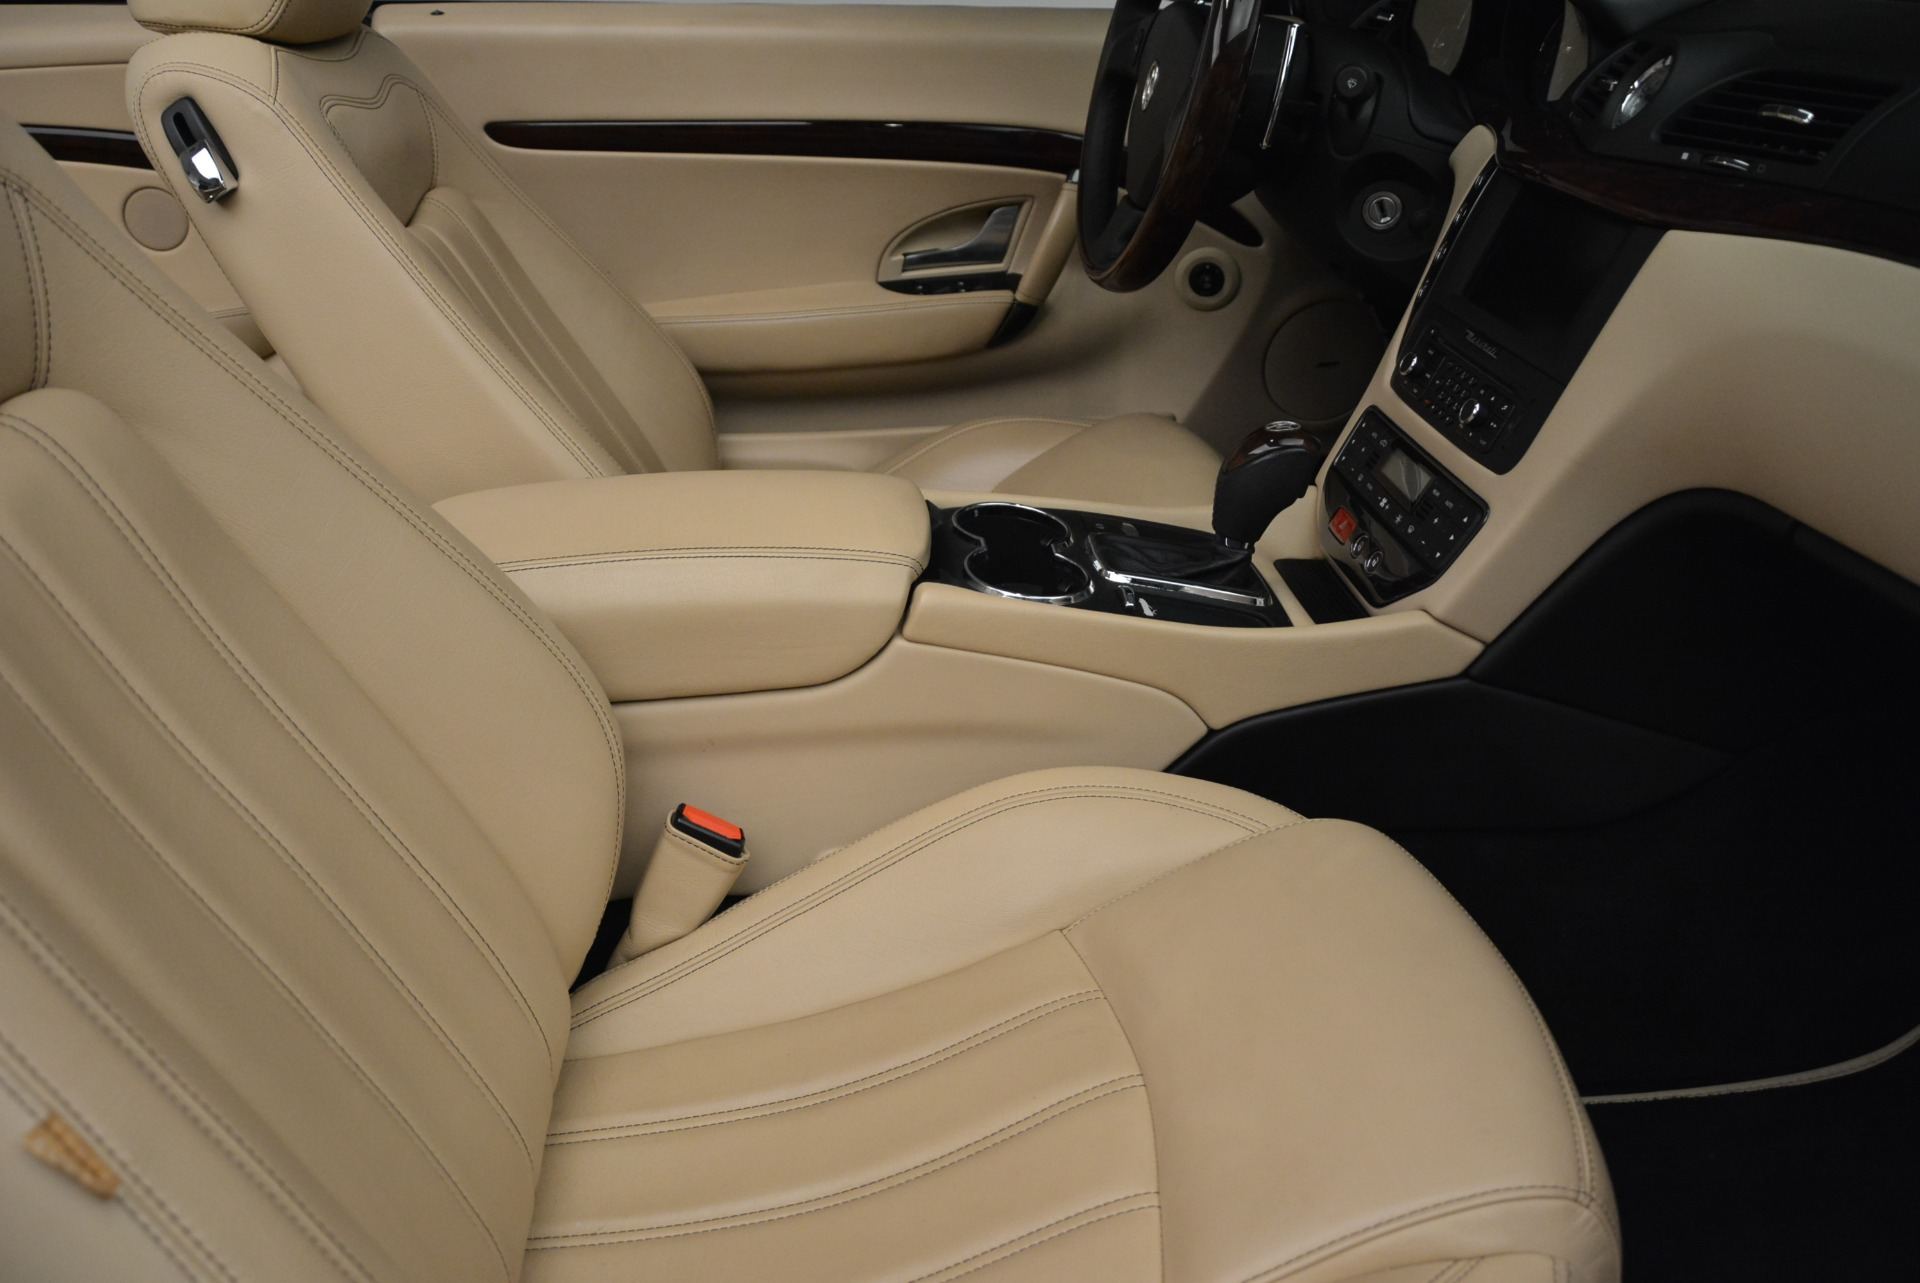 Used 2013 Maserati GranTurismo Convertible  For Sale In Westport, CT 2050_p33